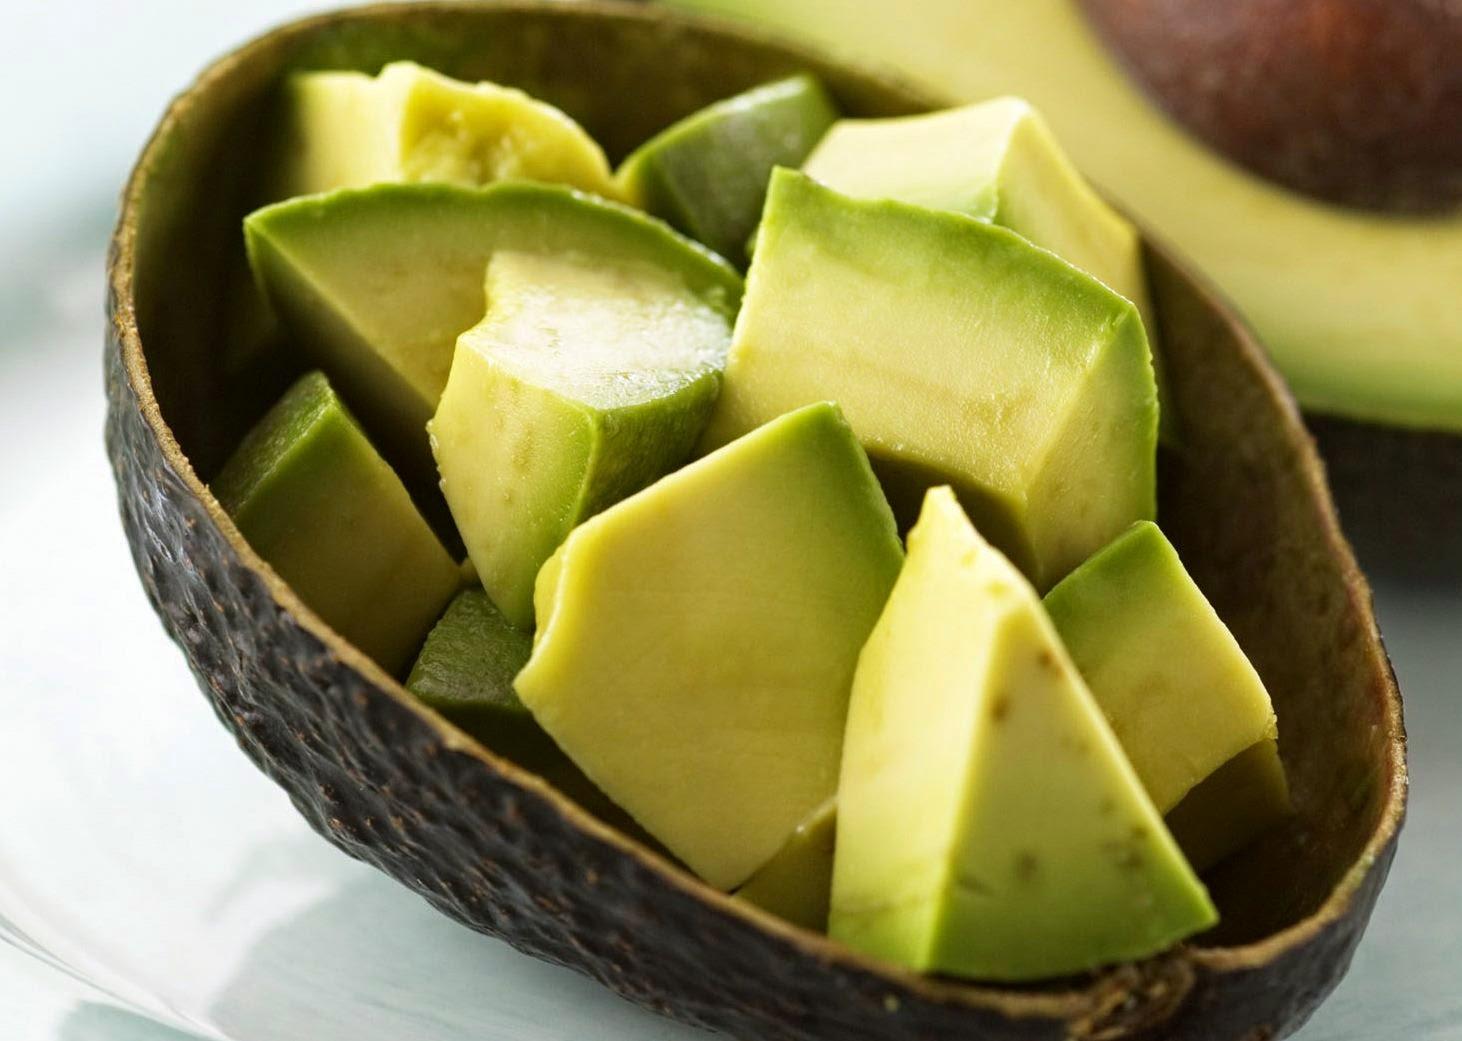 manfaat buah alpukat untuk ibu hamil